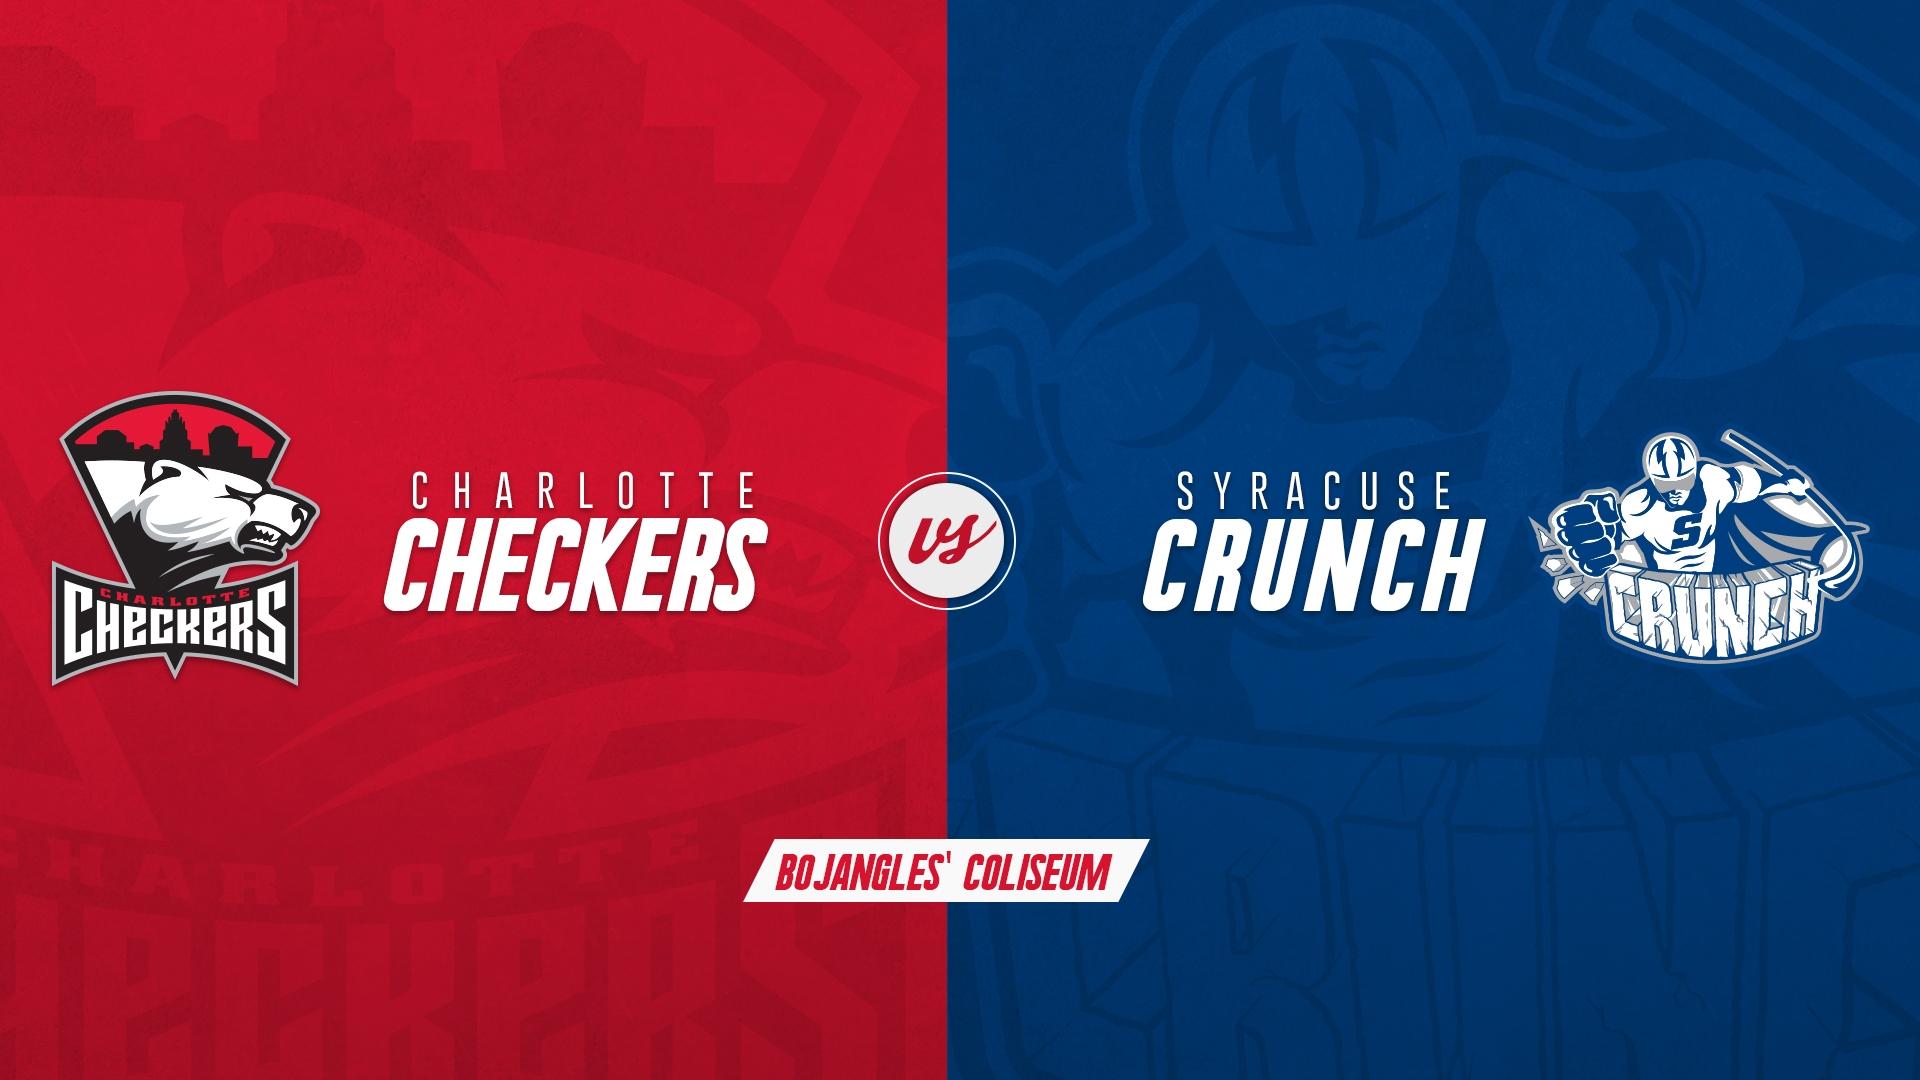 Charlotte Checkers vs. Syracuse Crunch